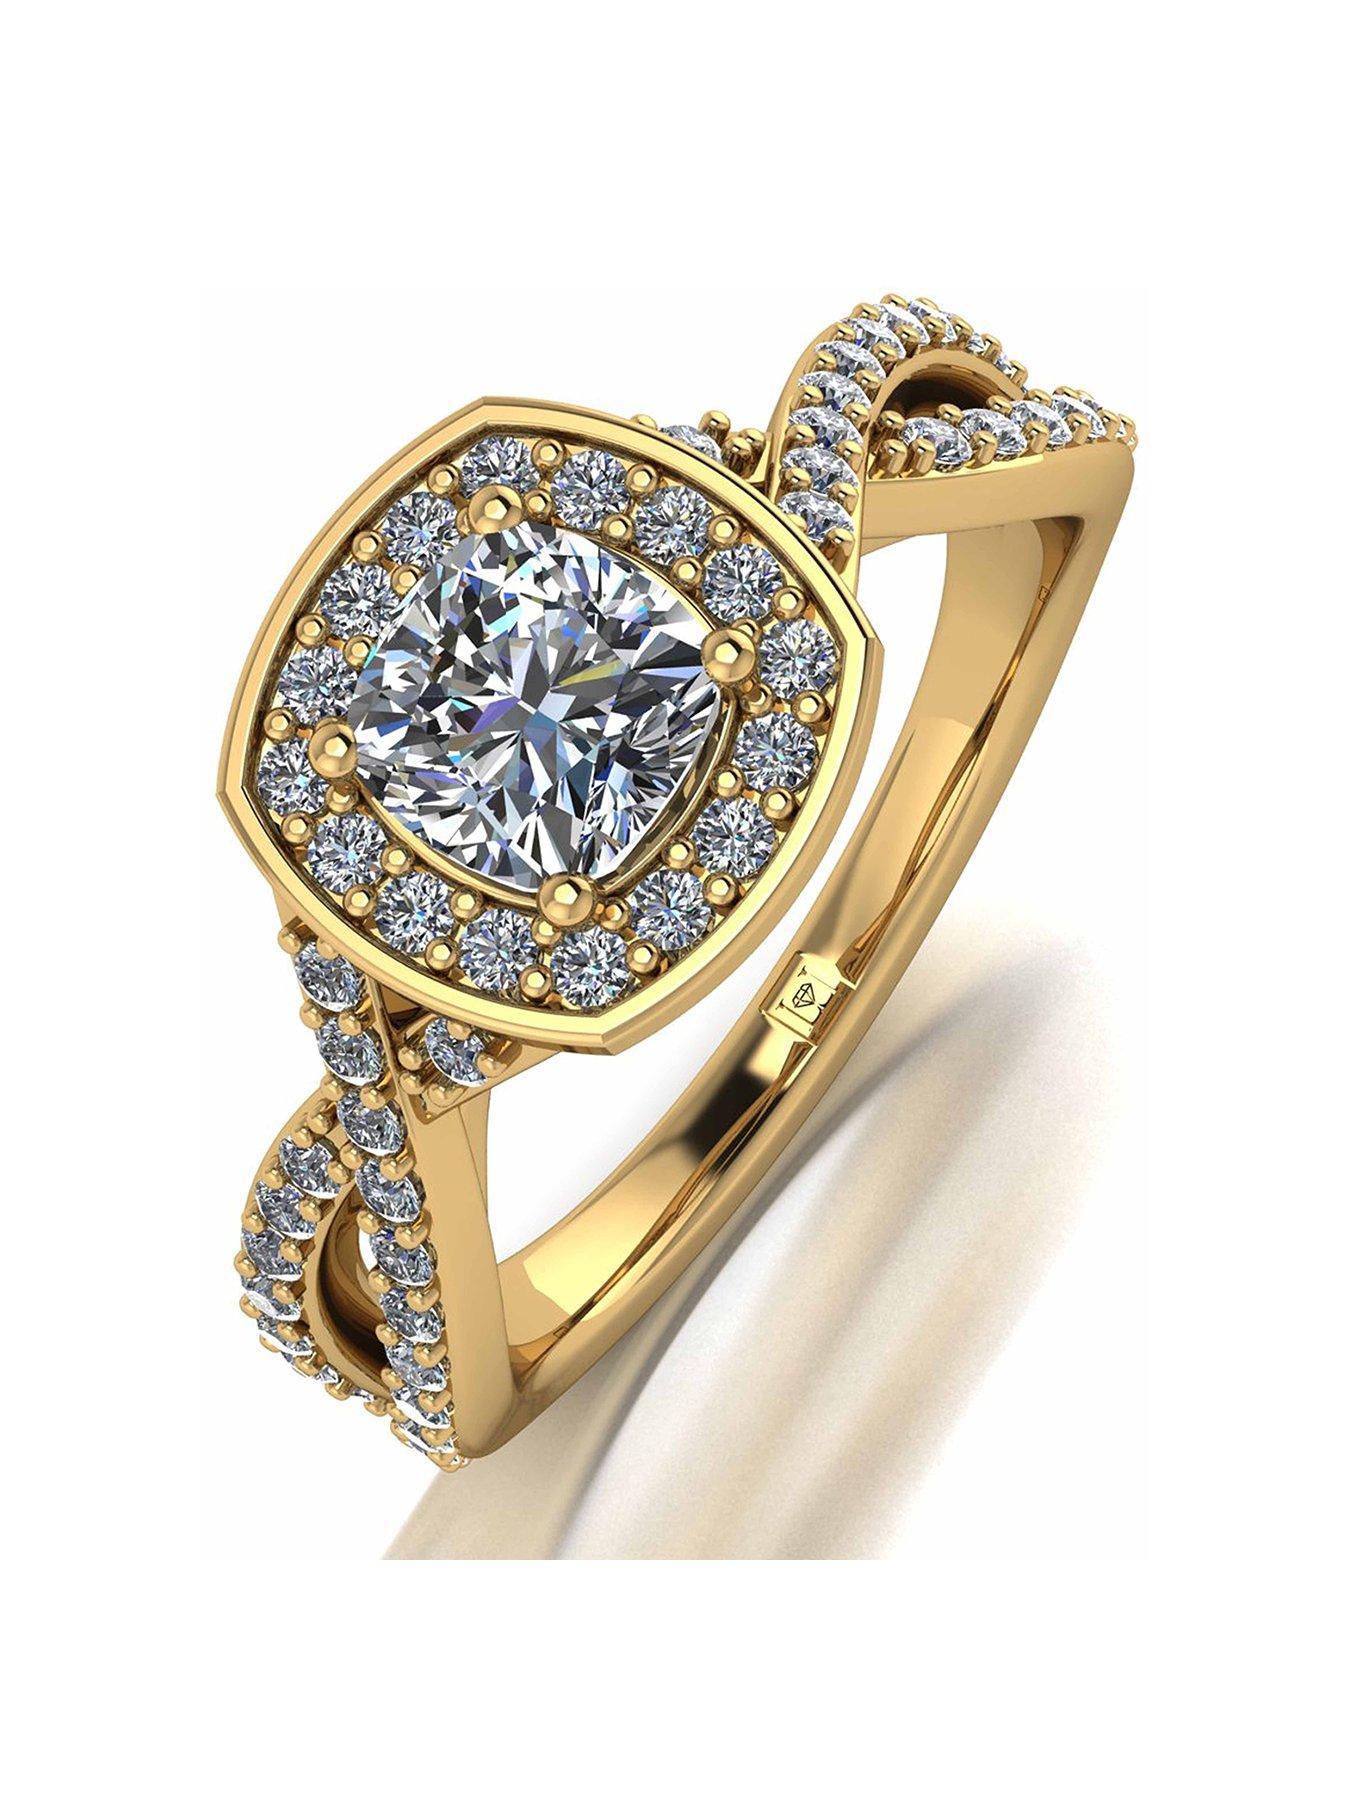 9ct Gold Court Shape Medium Weight Plain Wedding Band Ring Gift H-Z